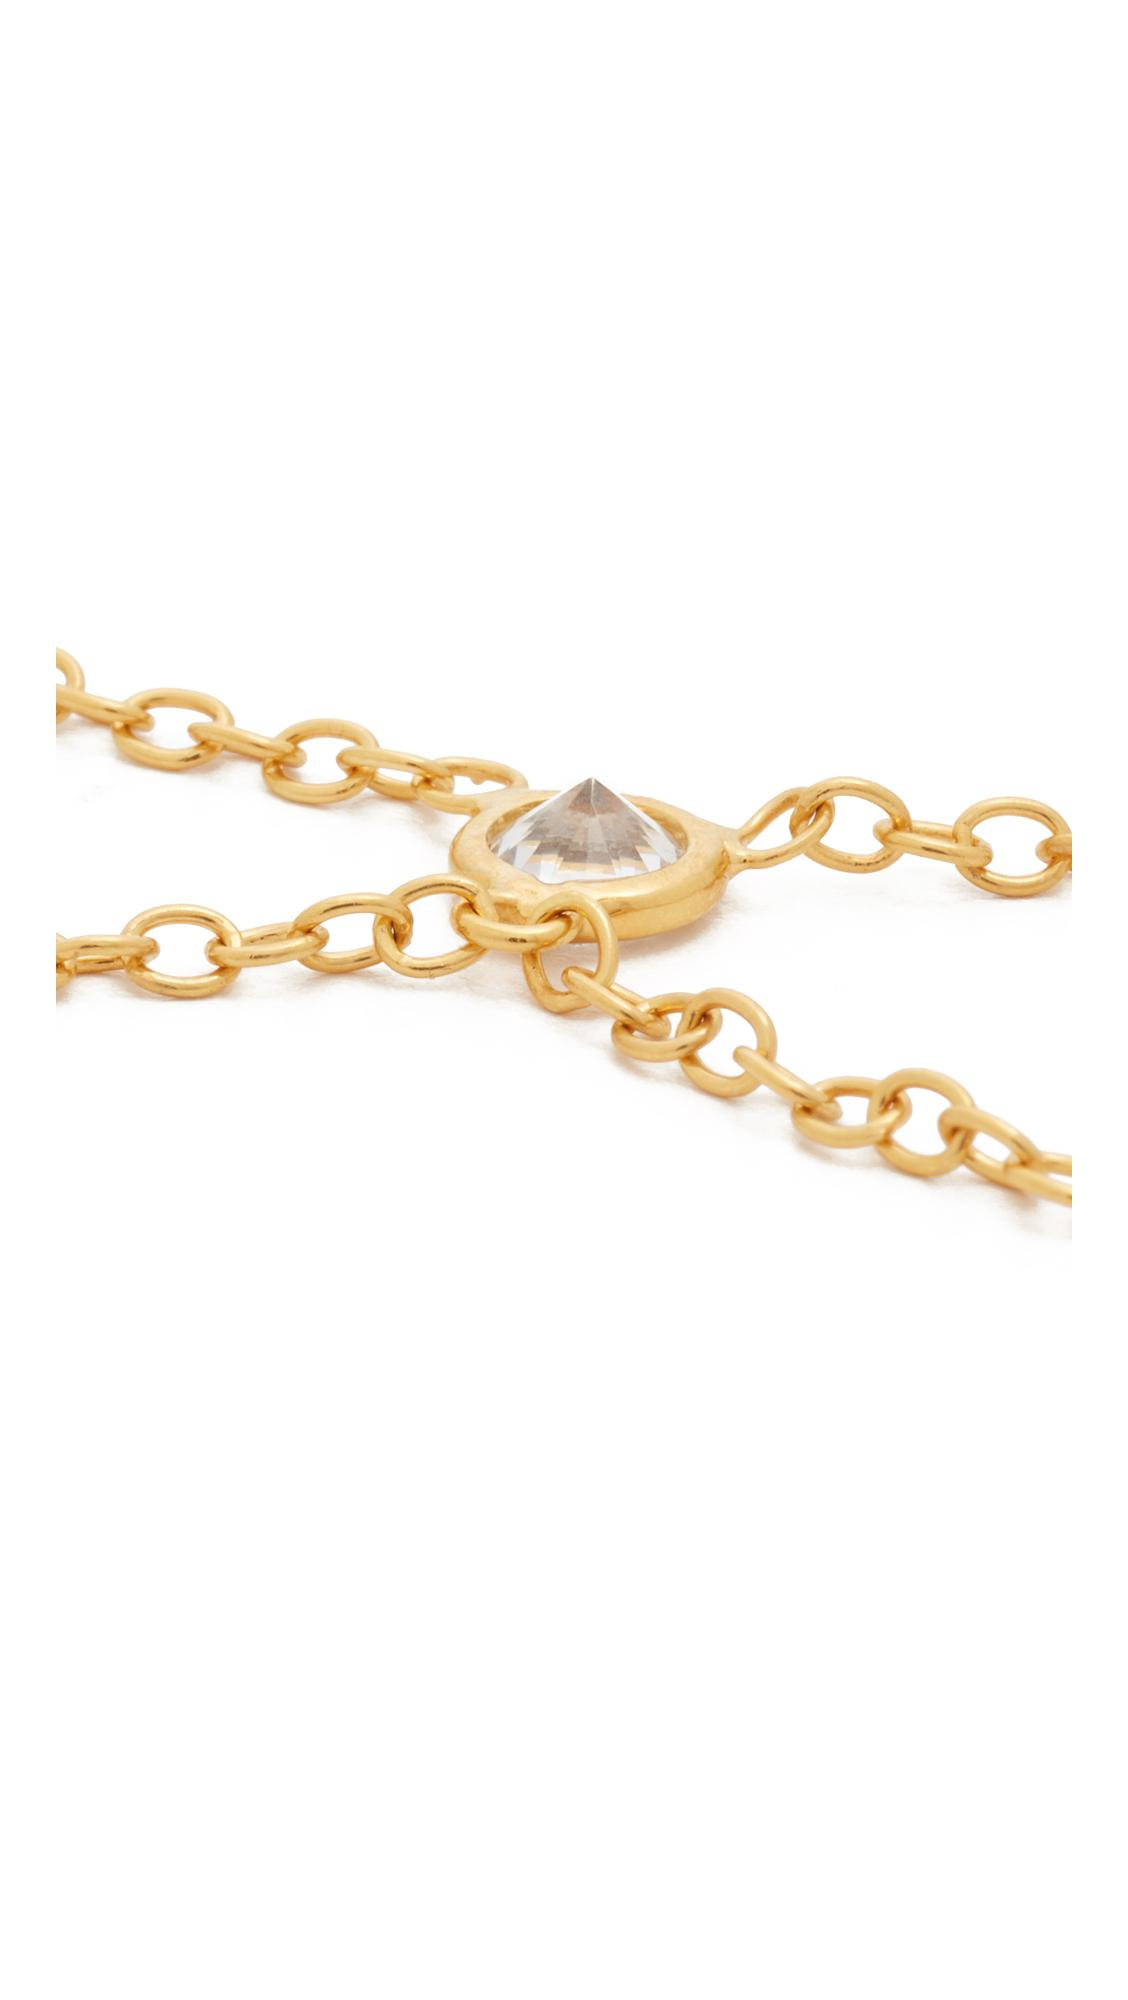 Jacquie Aiche Ja Selena Necklace in Metallic